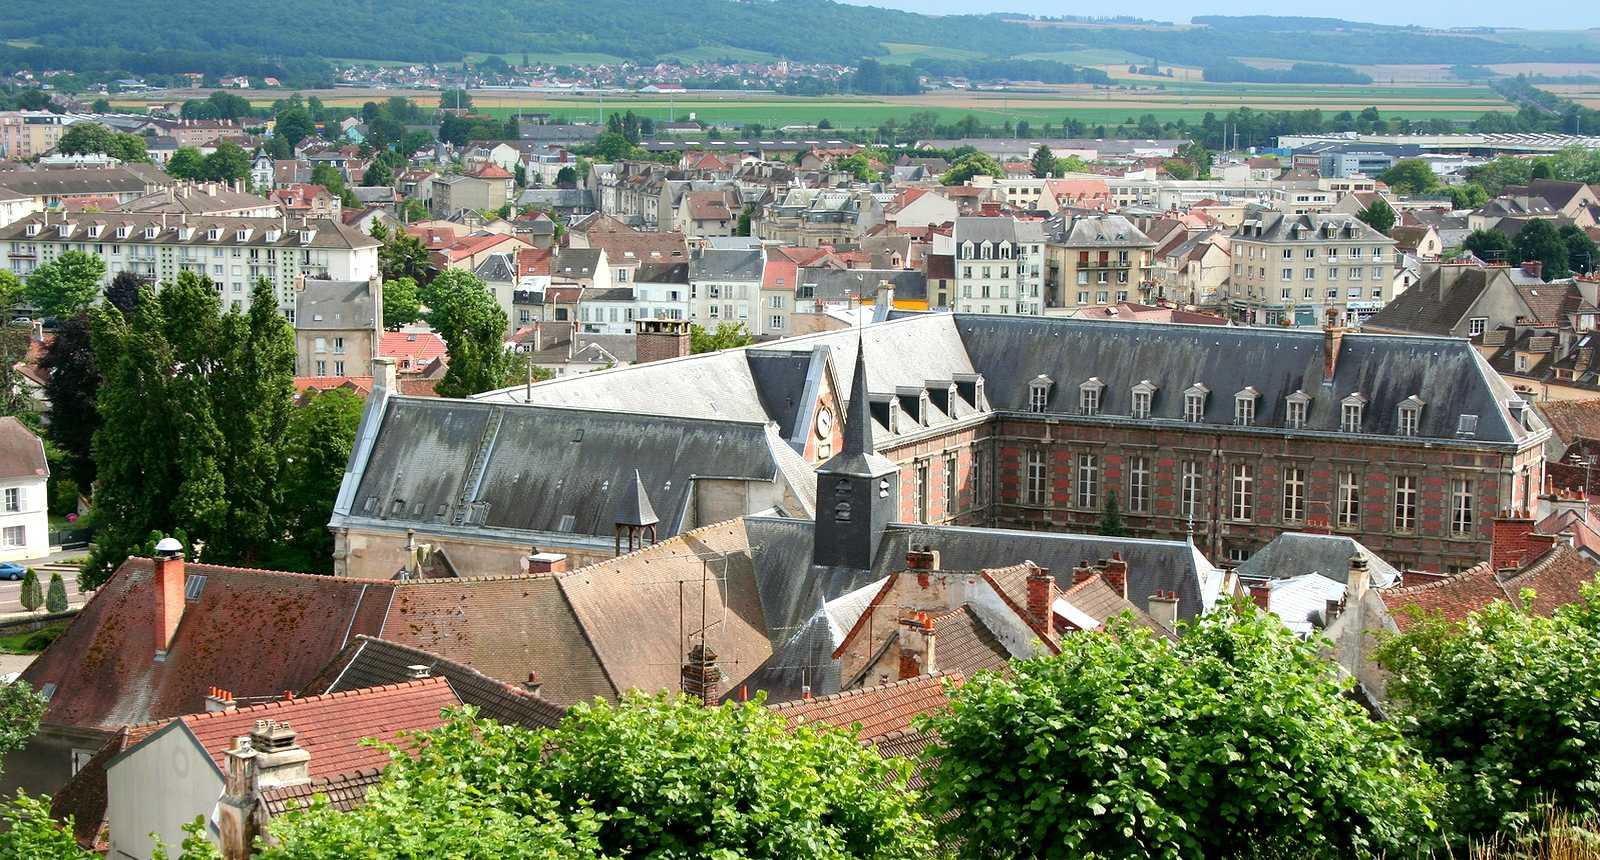 Château-Thierry (1)